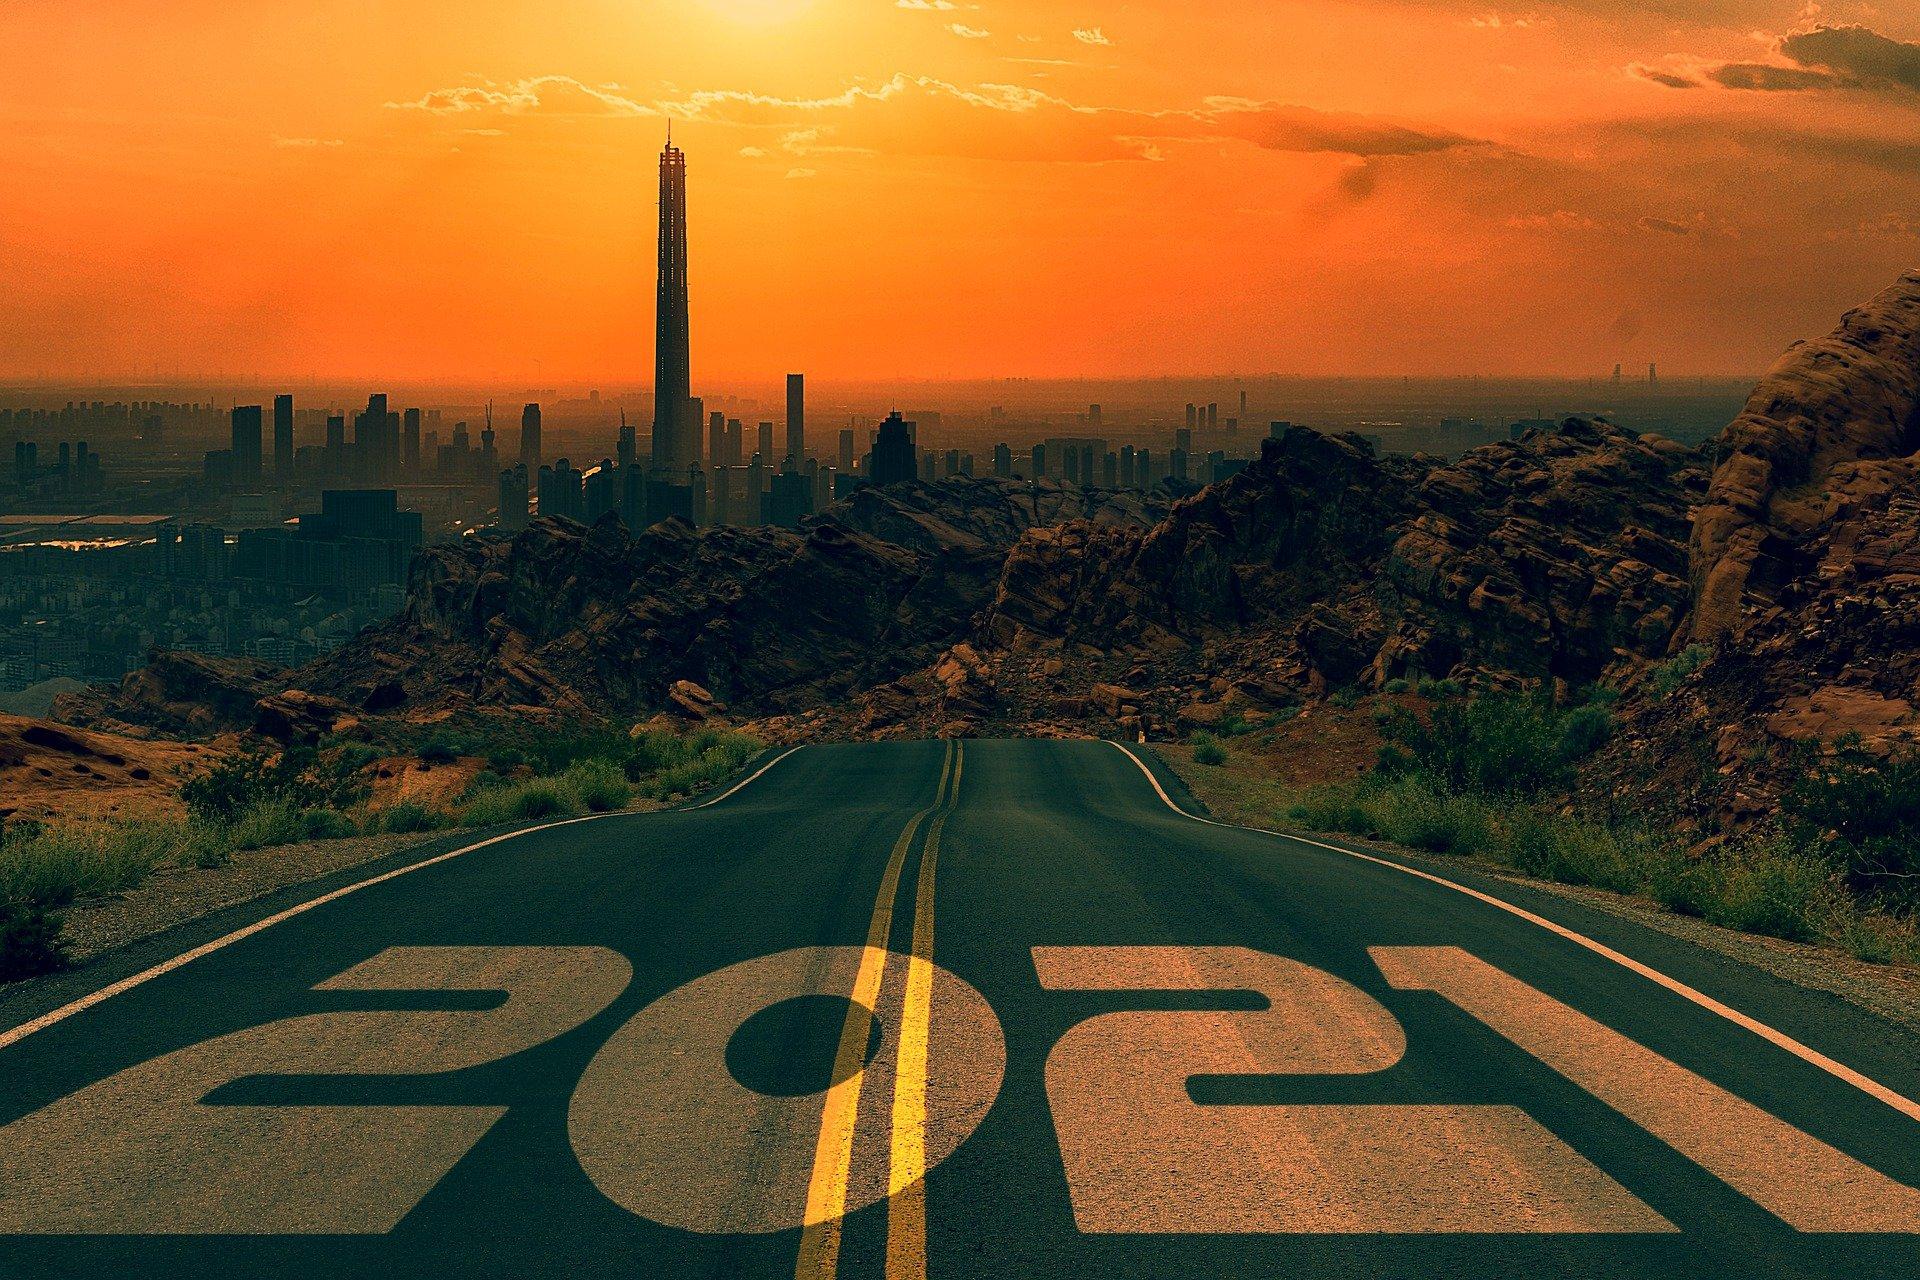 road-5799603_1920